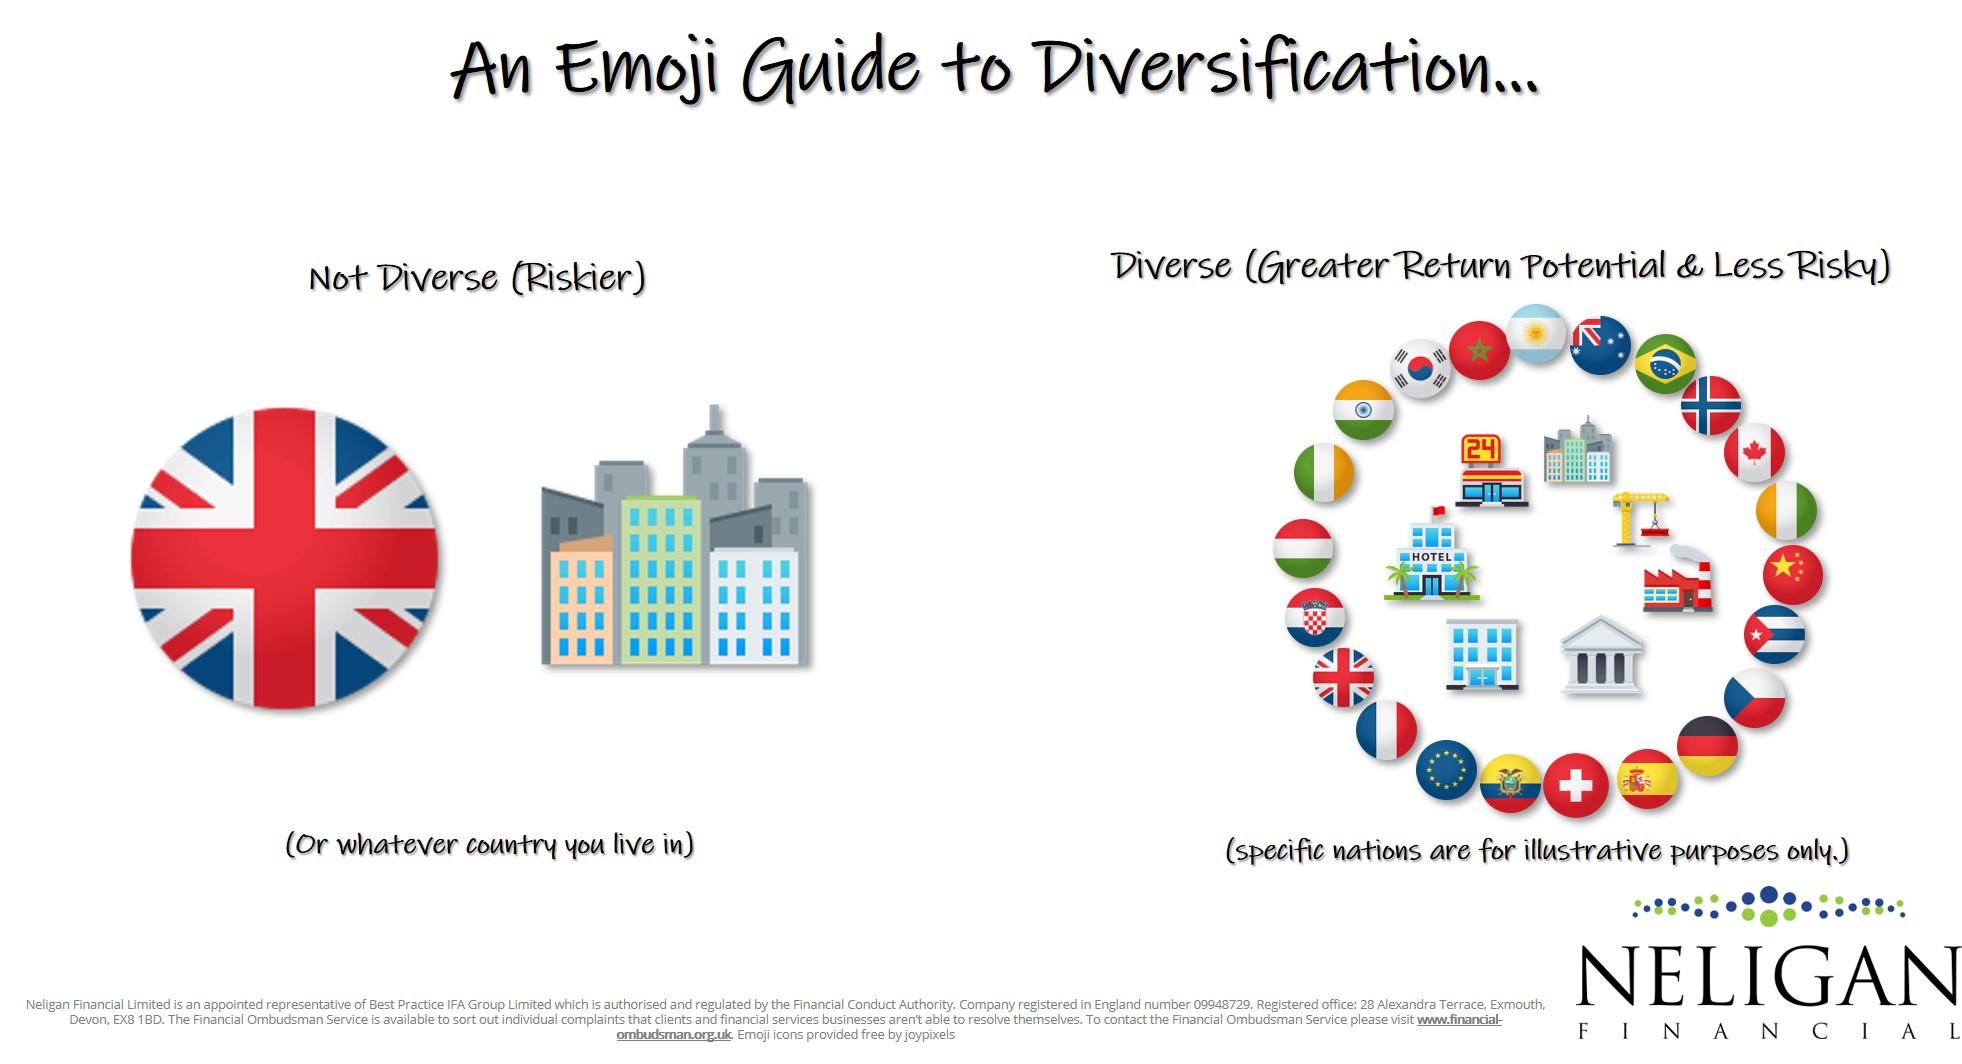 Emoji Guides Archives - Neligan Financial